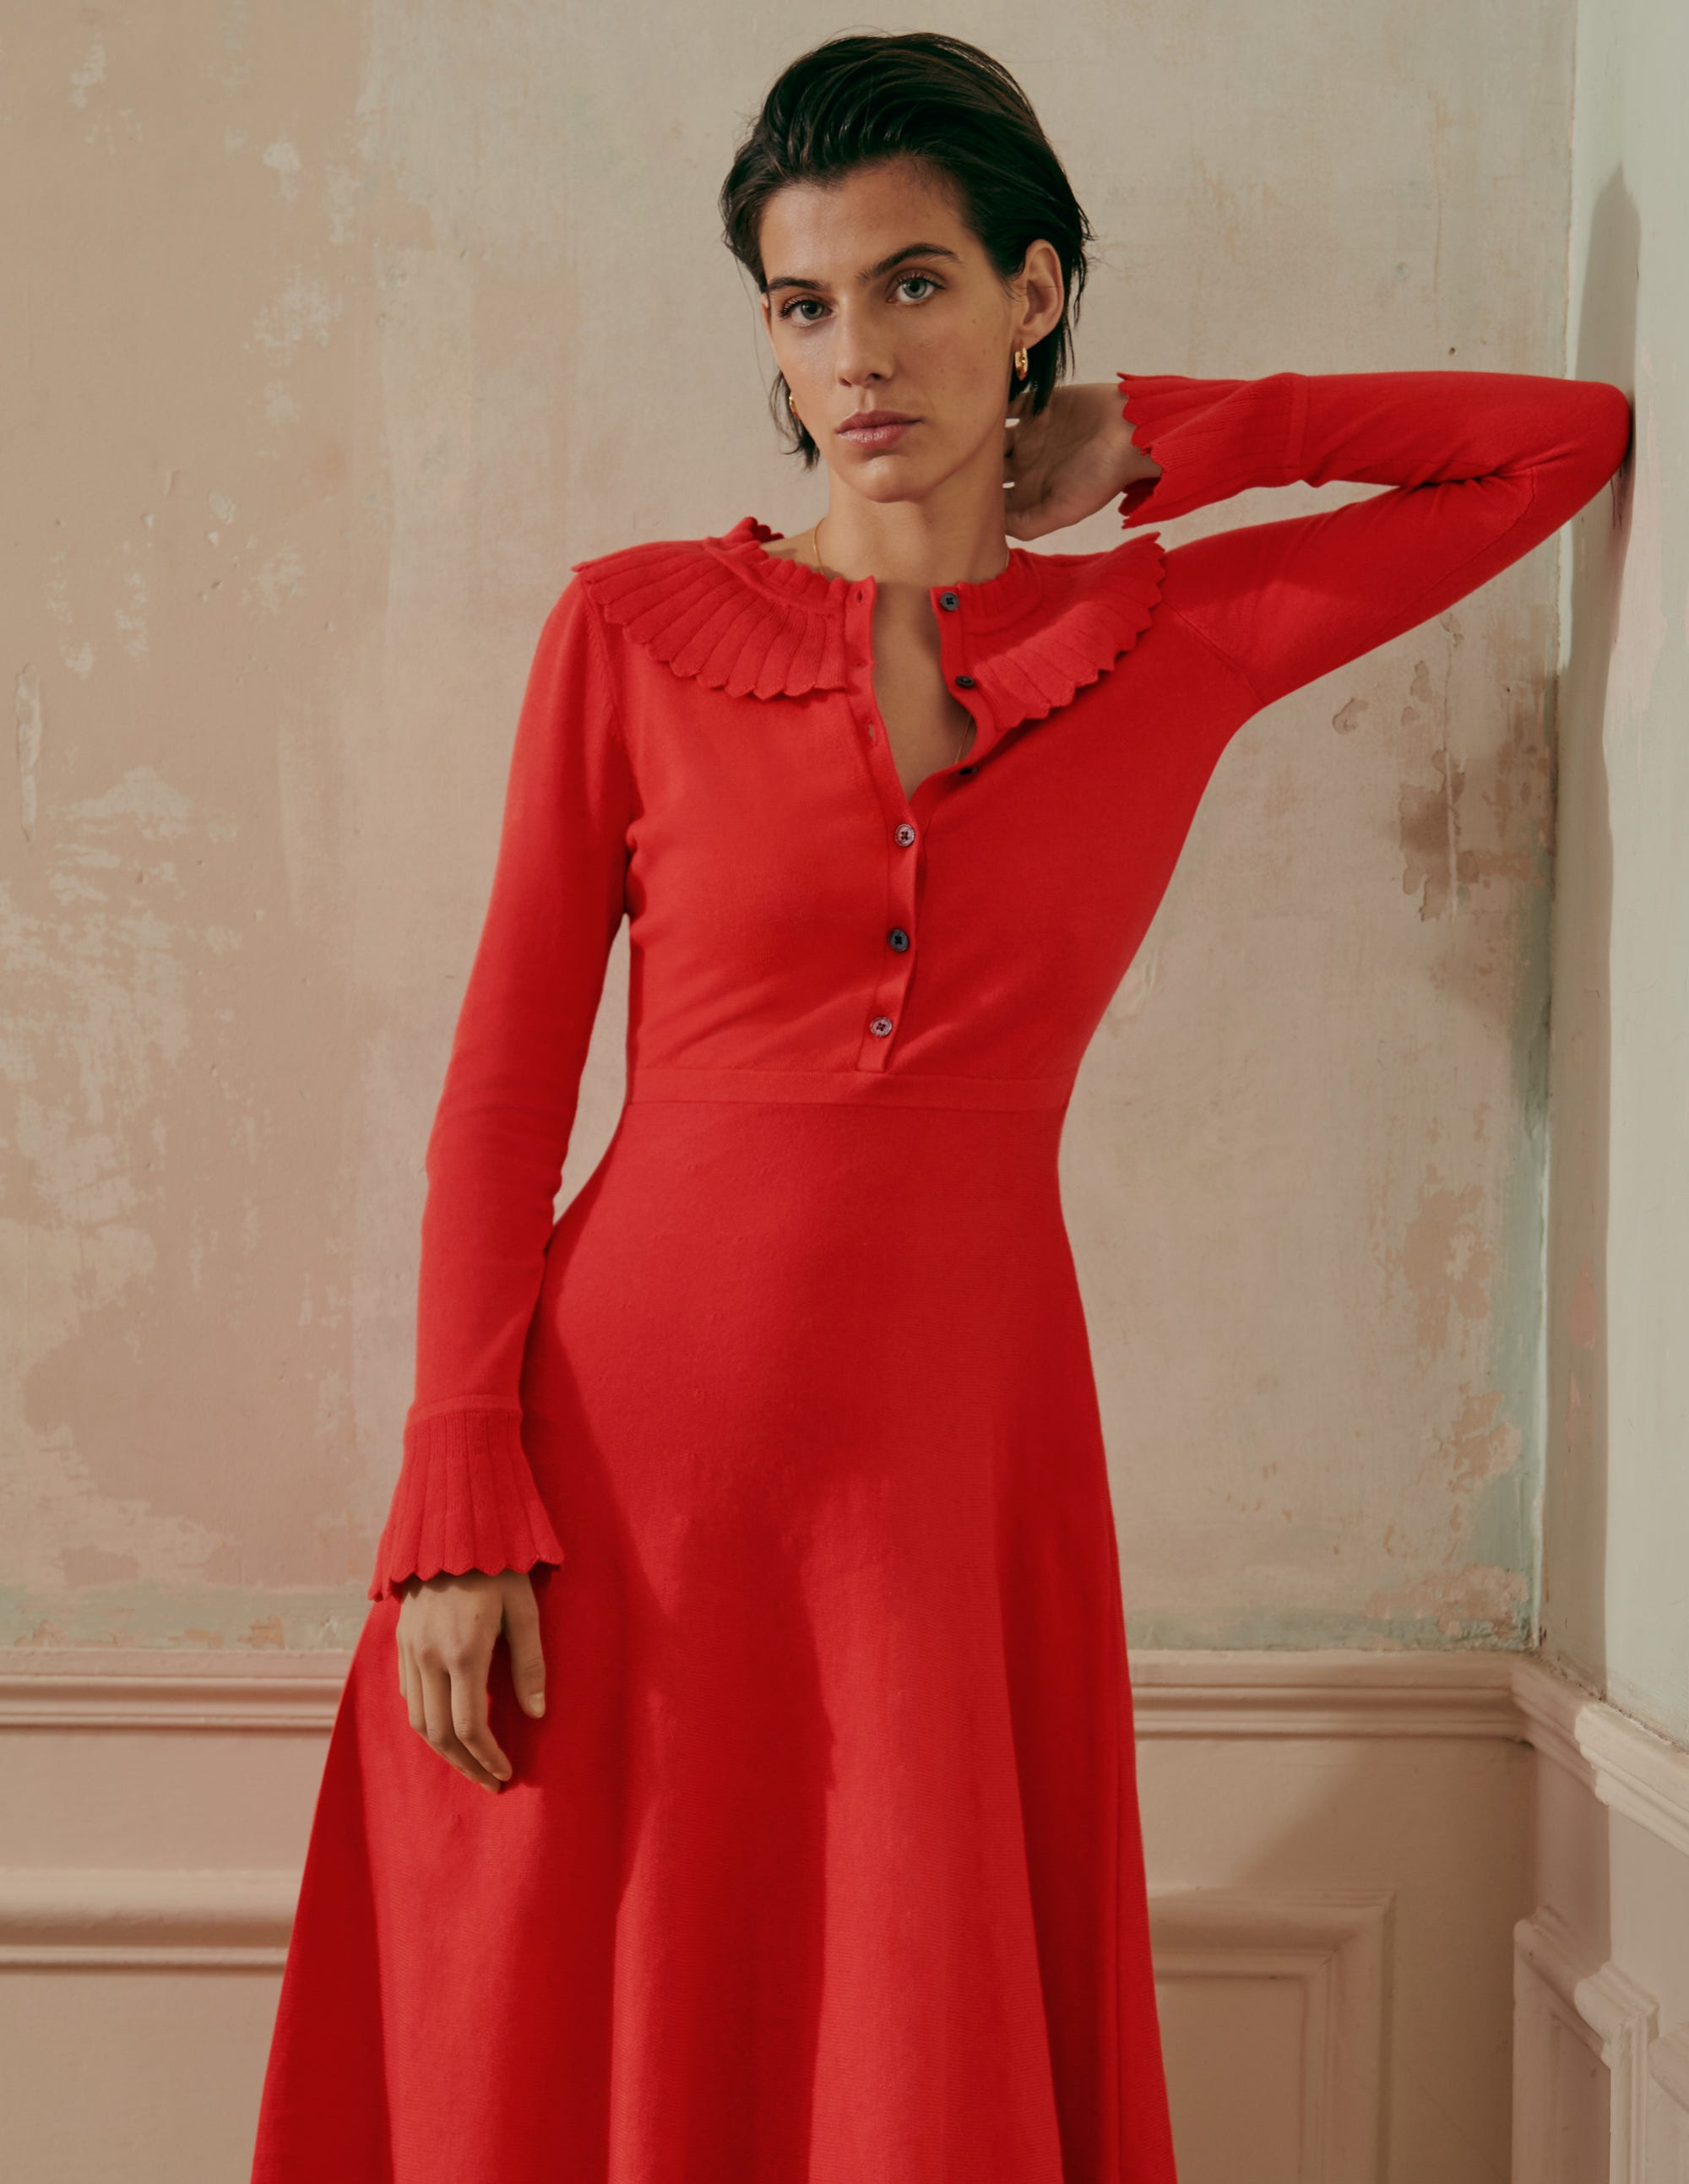 Boden Abercorn Knitted Dress - Cherry Red